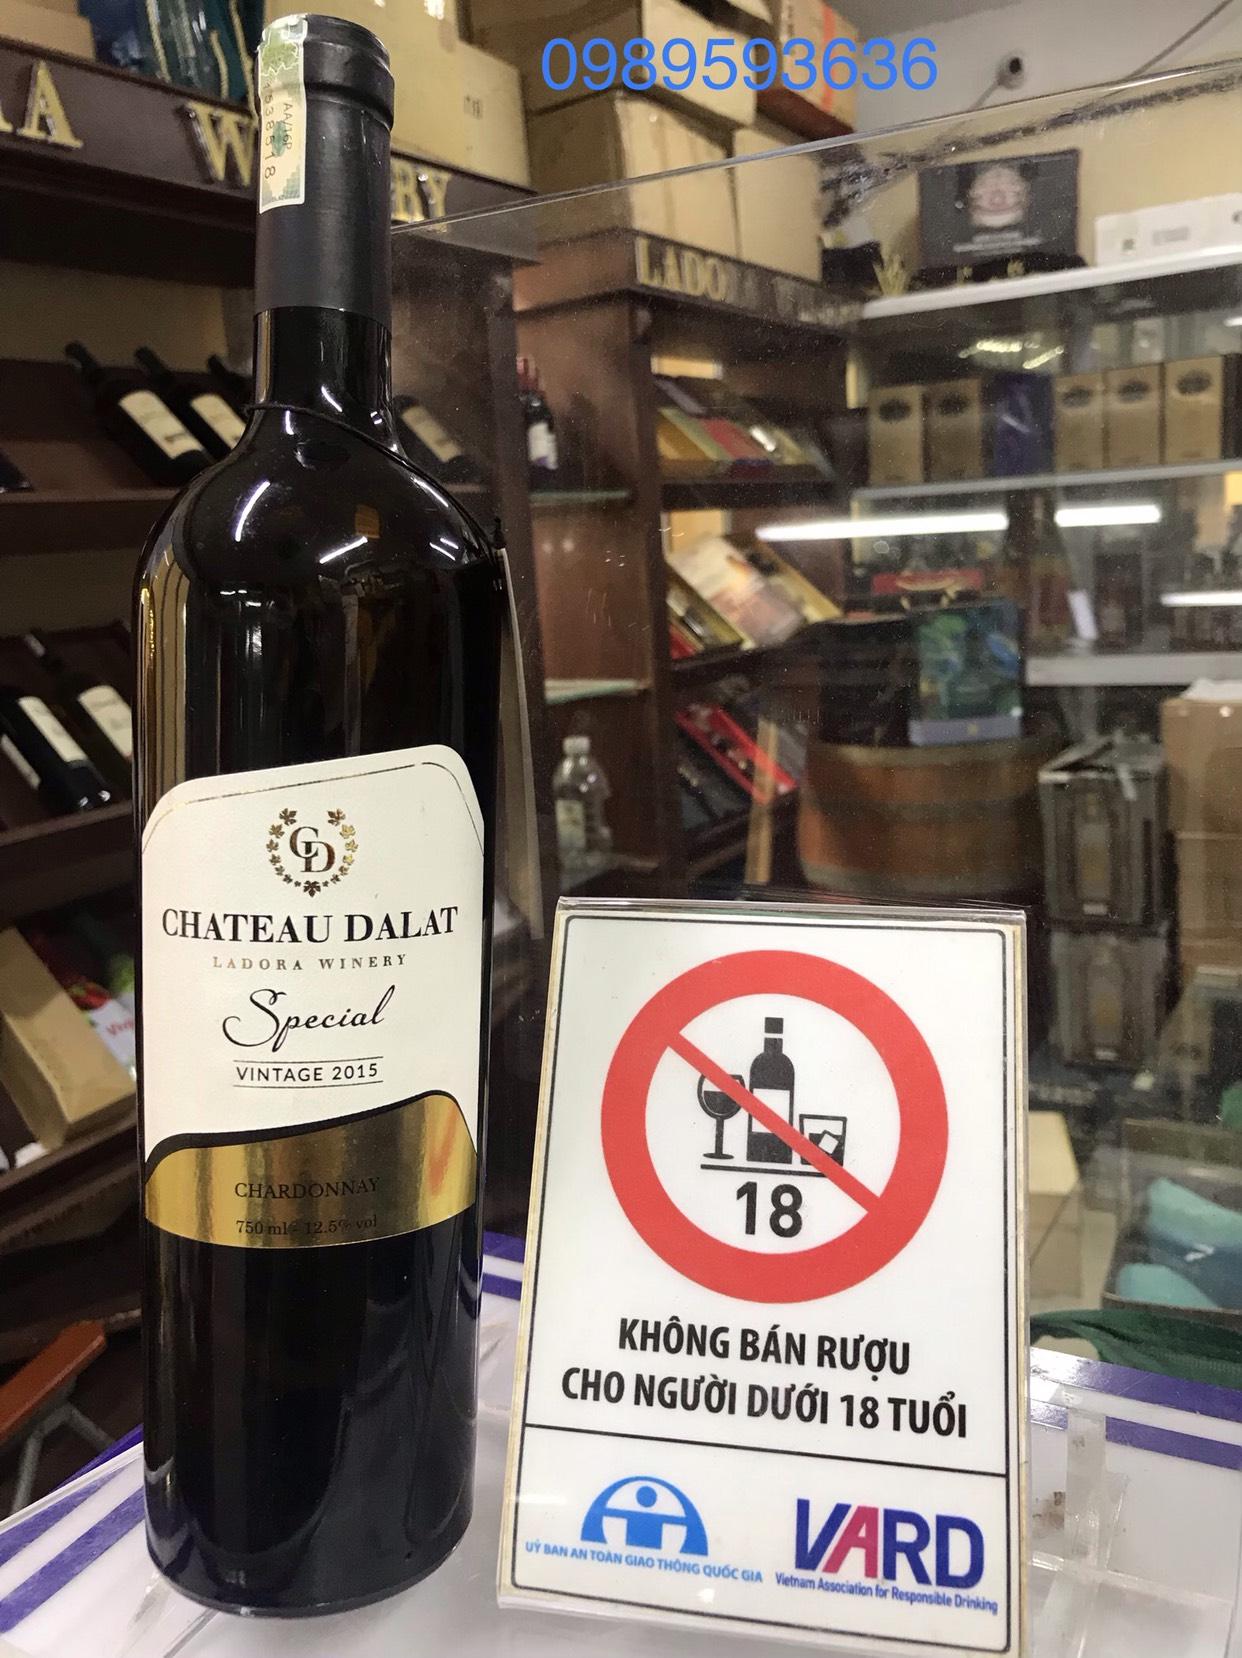 R??u Chateau Dalat Special �C Cabernet Sauvignon